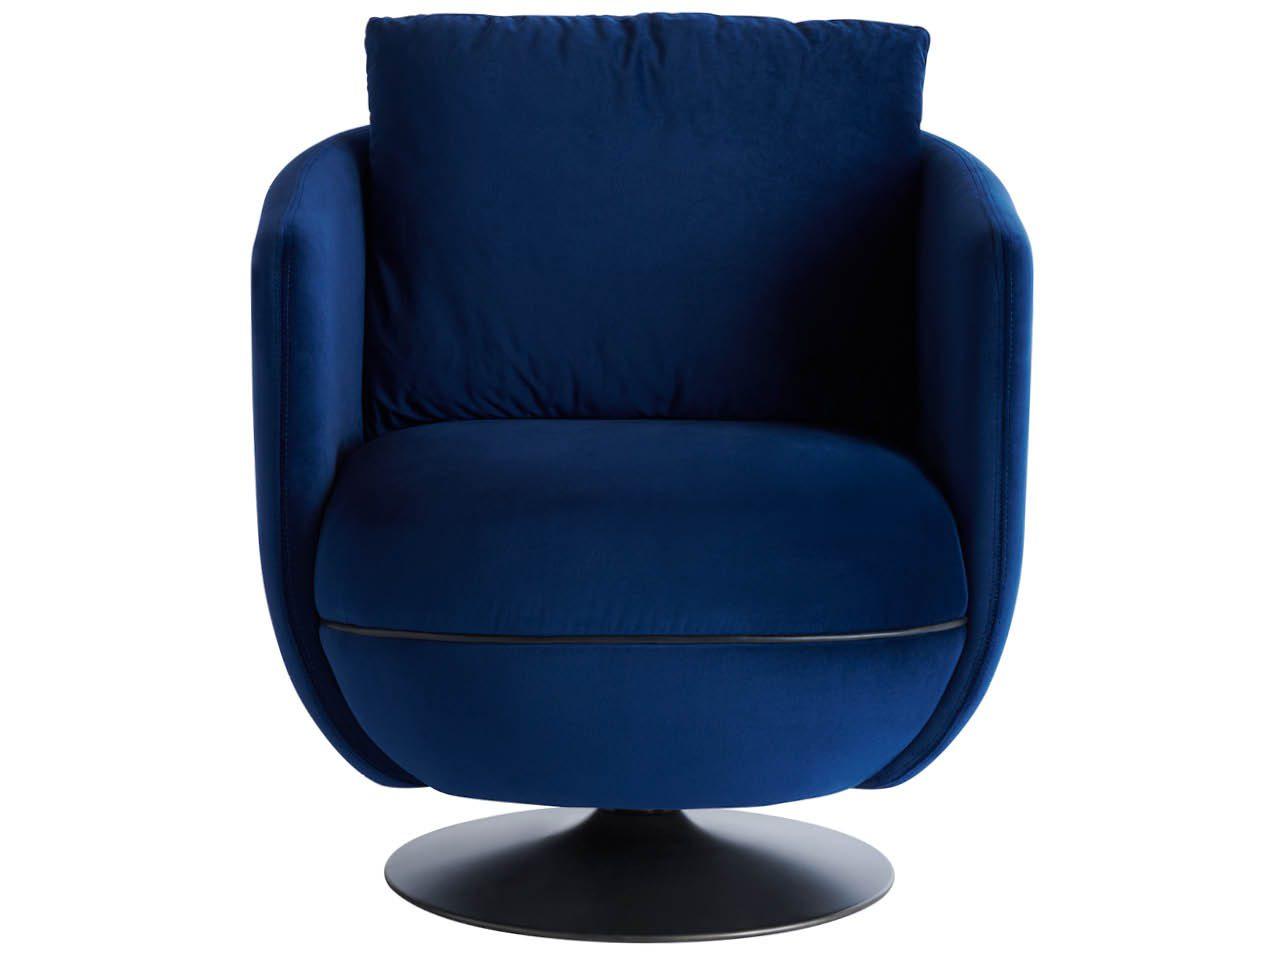 Awe Inspiring Magon Accent Chair 1 Contour Interior Design Camellatalisay Diy Chair Ideas Camellatalisaycom